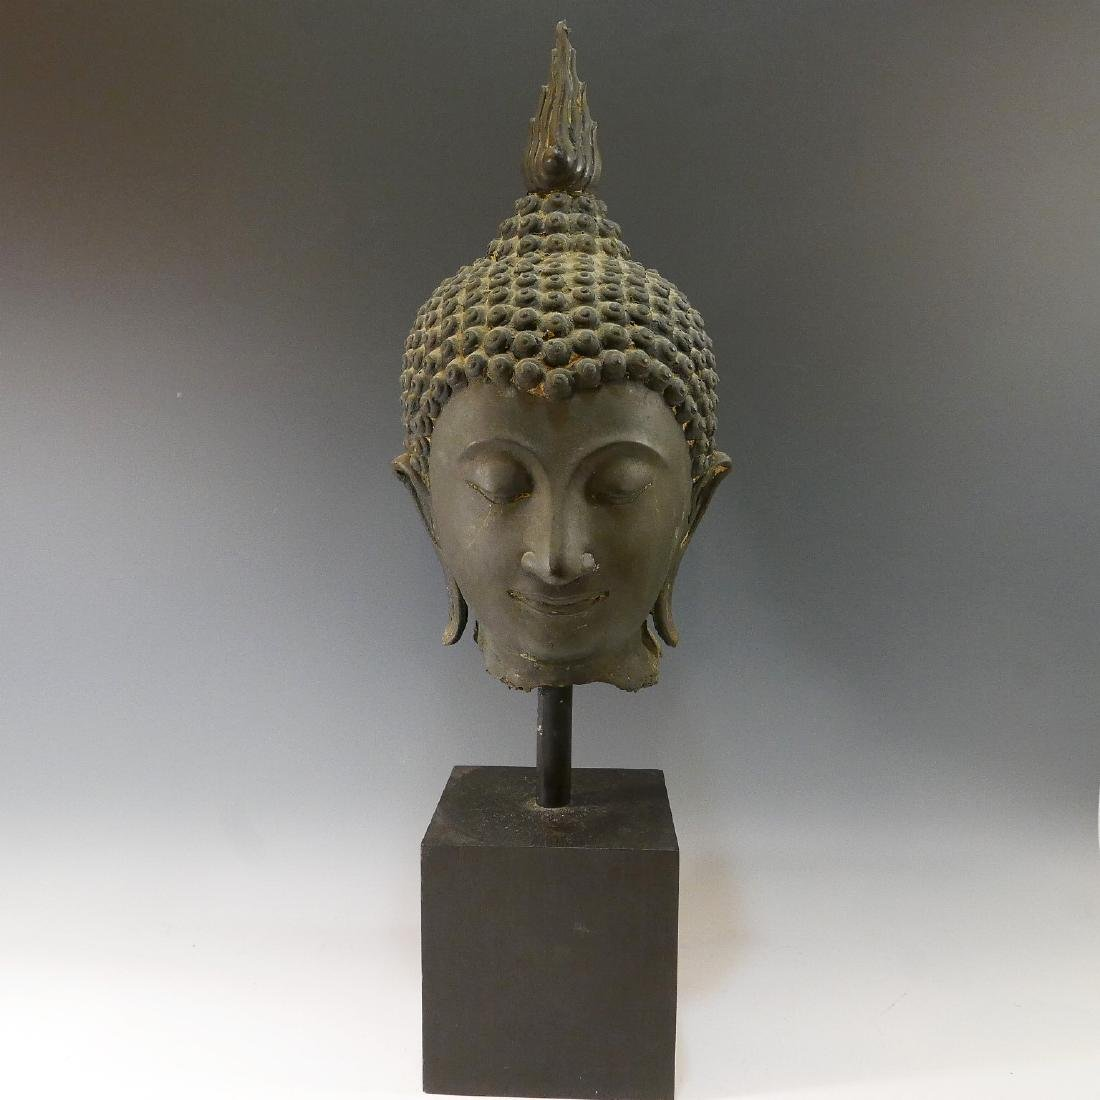 VERY LARGE THAI BRONZE BUDDHA HEAD - 18TH CENTURY